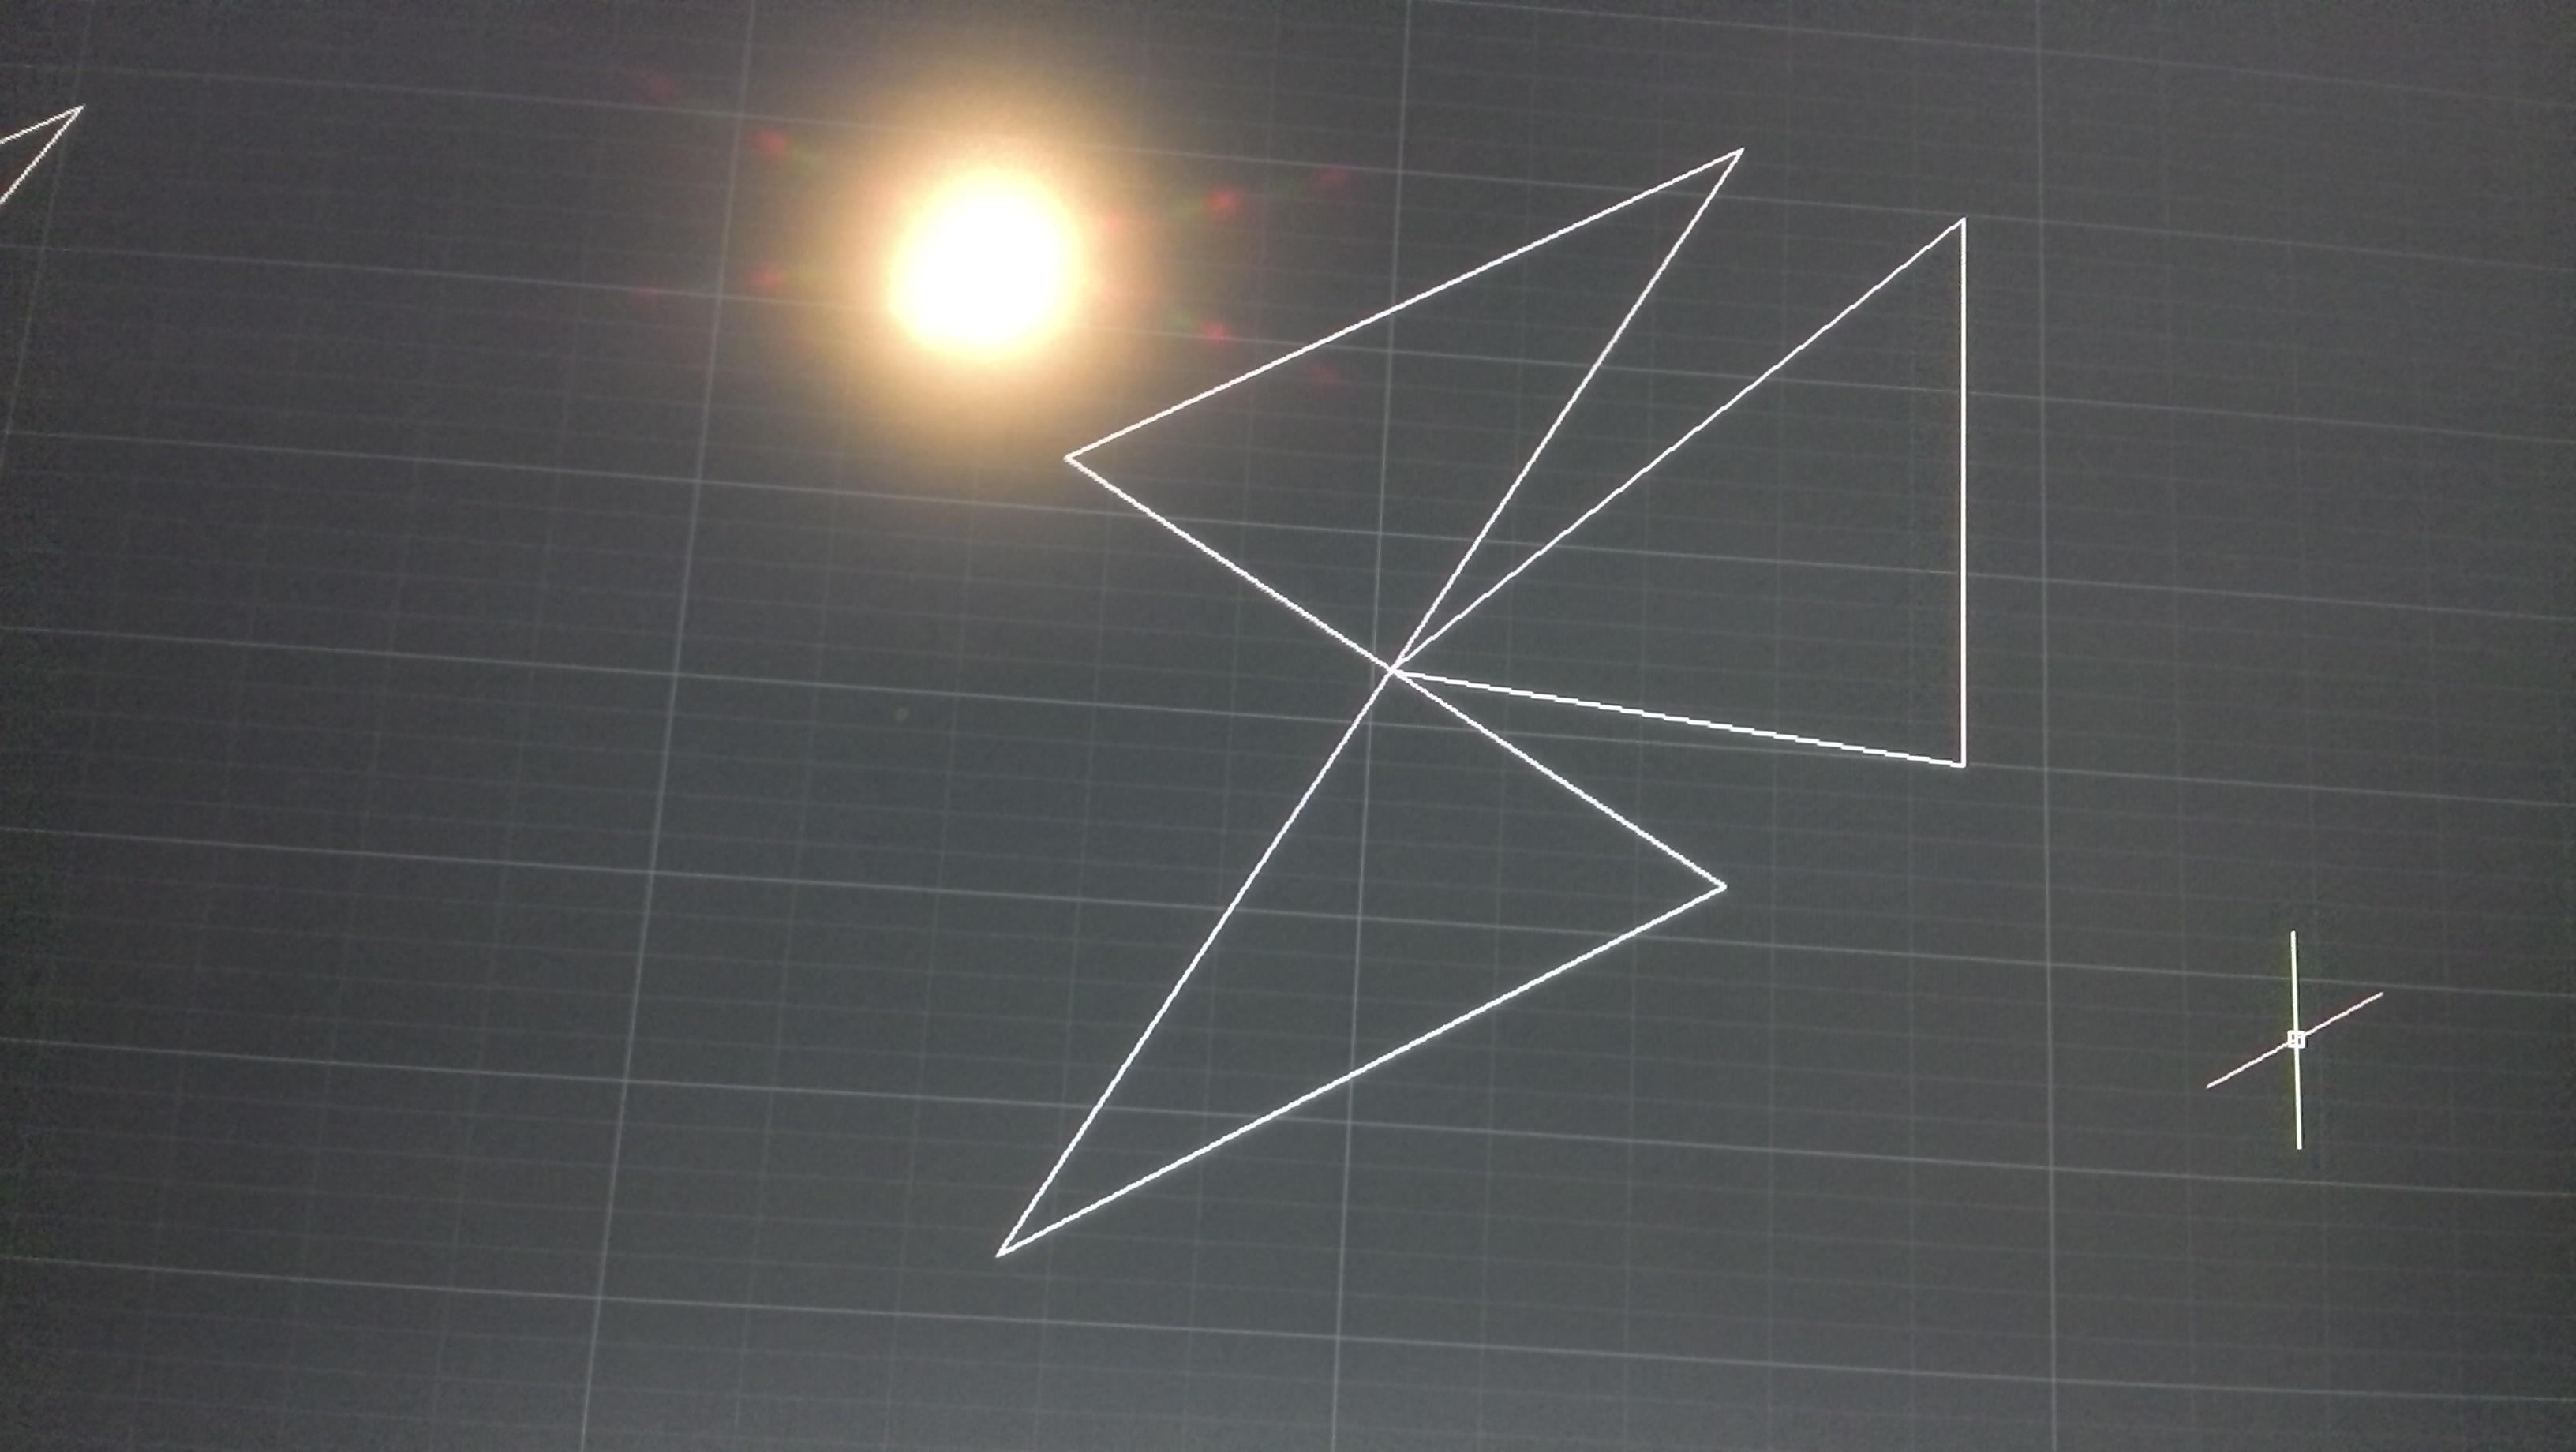 Autocad Isometrie 30° Strangschema (Autodesk/Rund um AutoCAD) - AUGCE.de